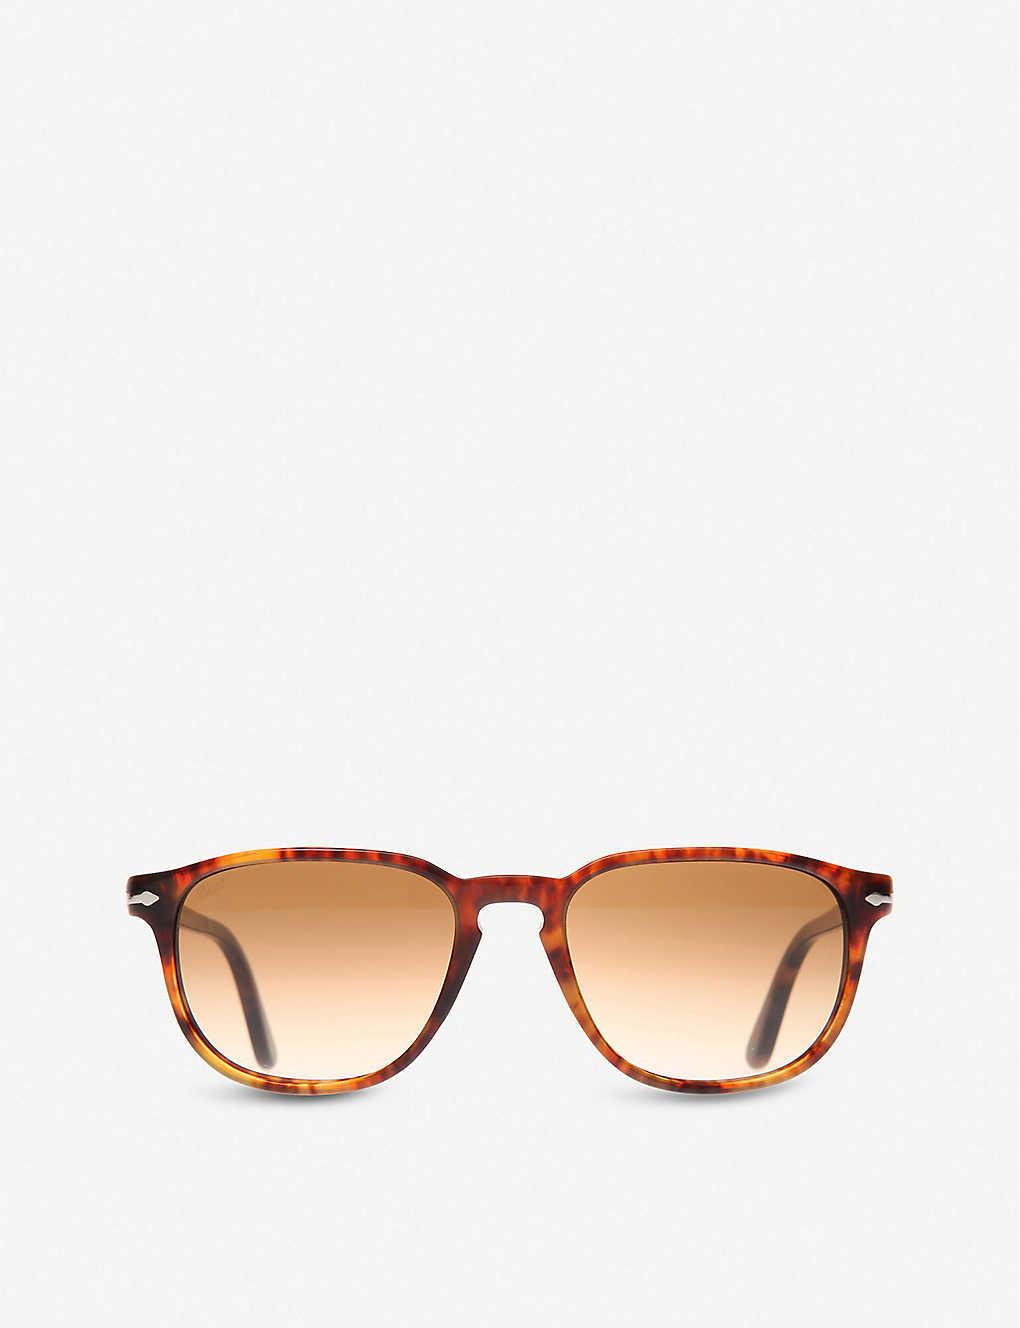 ffbf47a723cf5 Suprema tortoiseshell round-frame sunglasses - Spotted havana ...